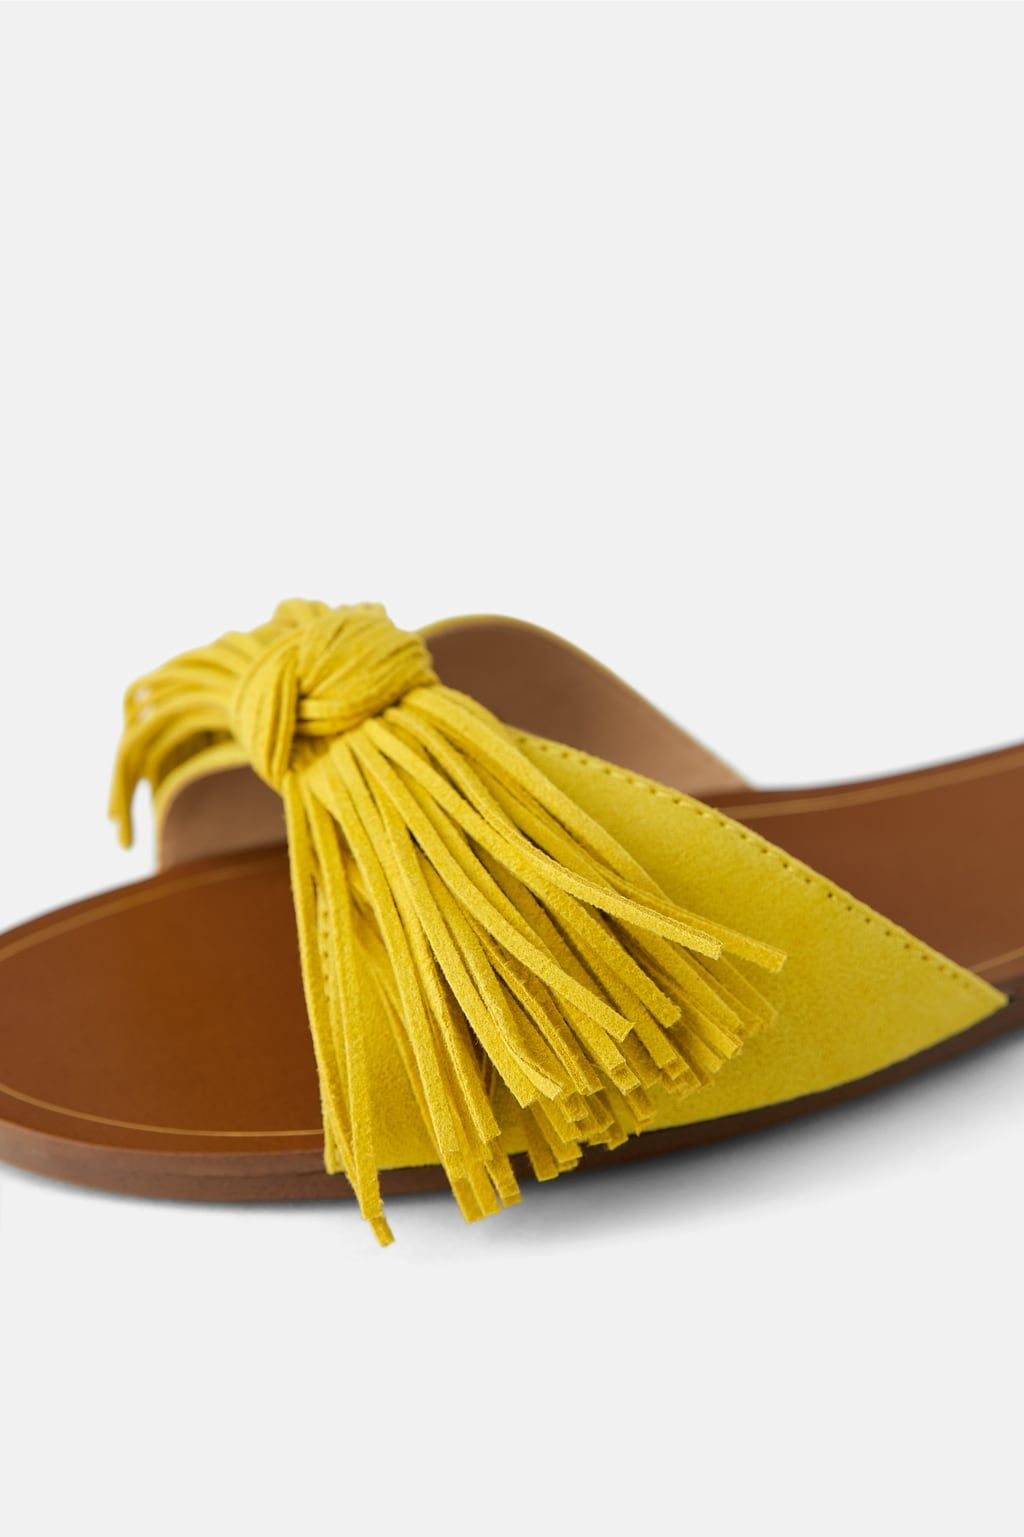 golondrina Desprecio Migración  SANDALIA PLANA FLECOS-Ver Todo-ZAPATOS-MUJER | ZARA España | Sandalias  planas, Zapatos mujer de moda, Zapatos comodos mujer